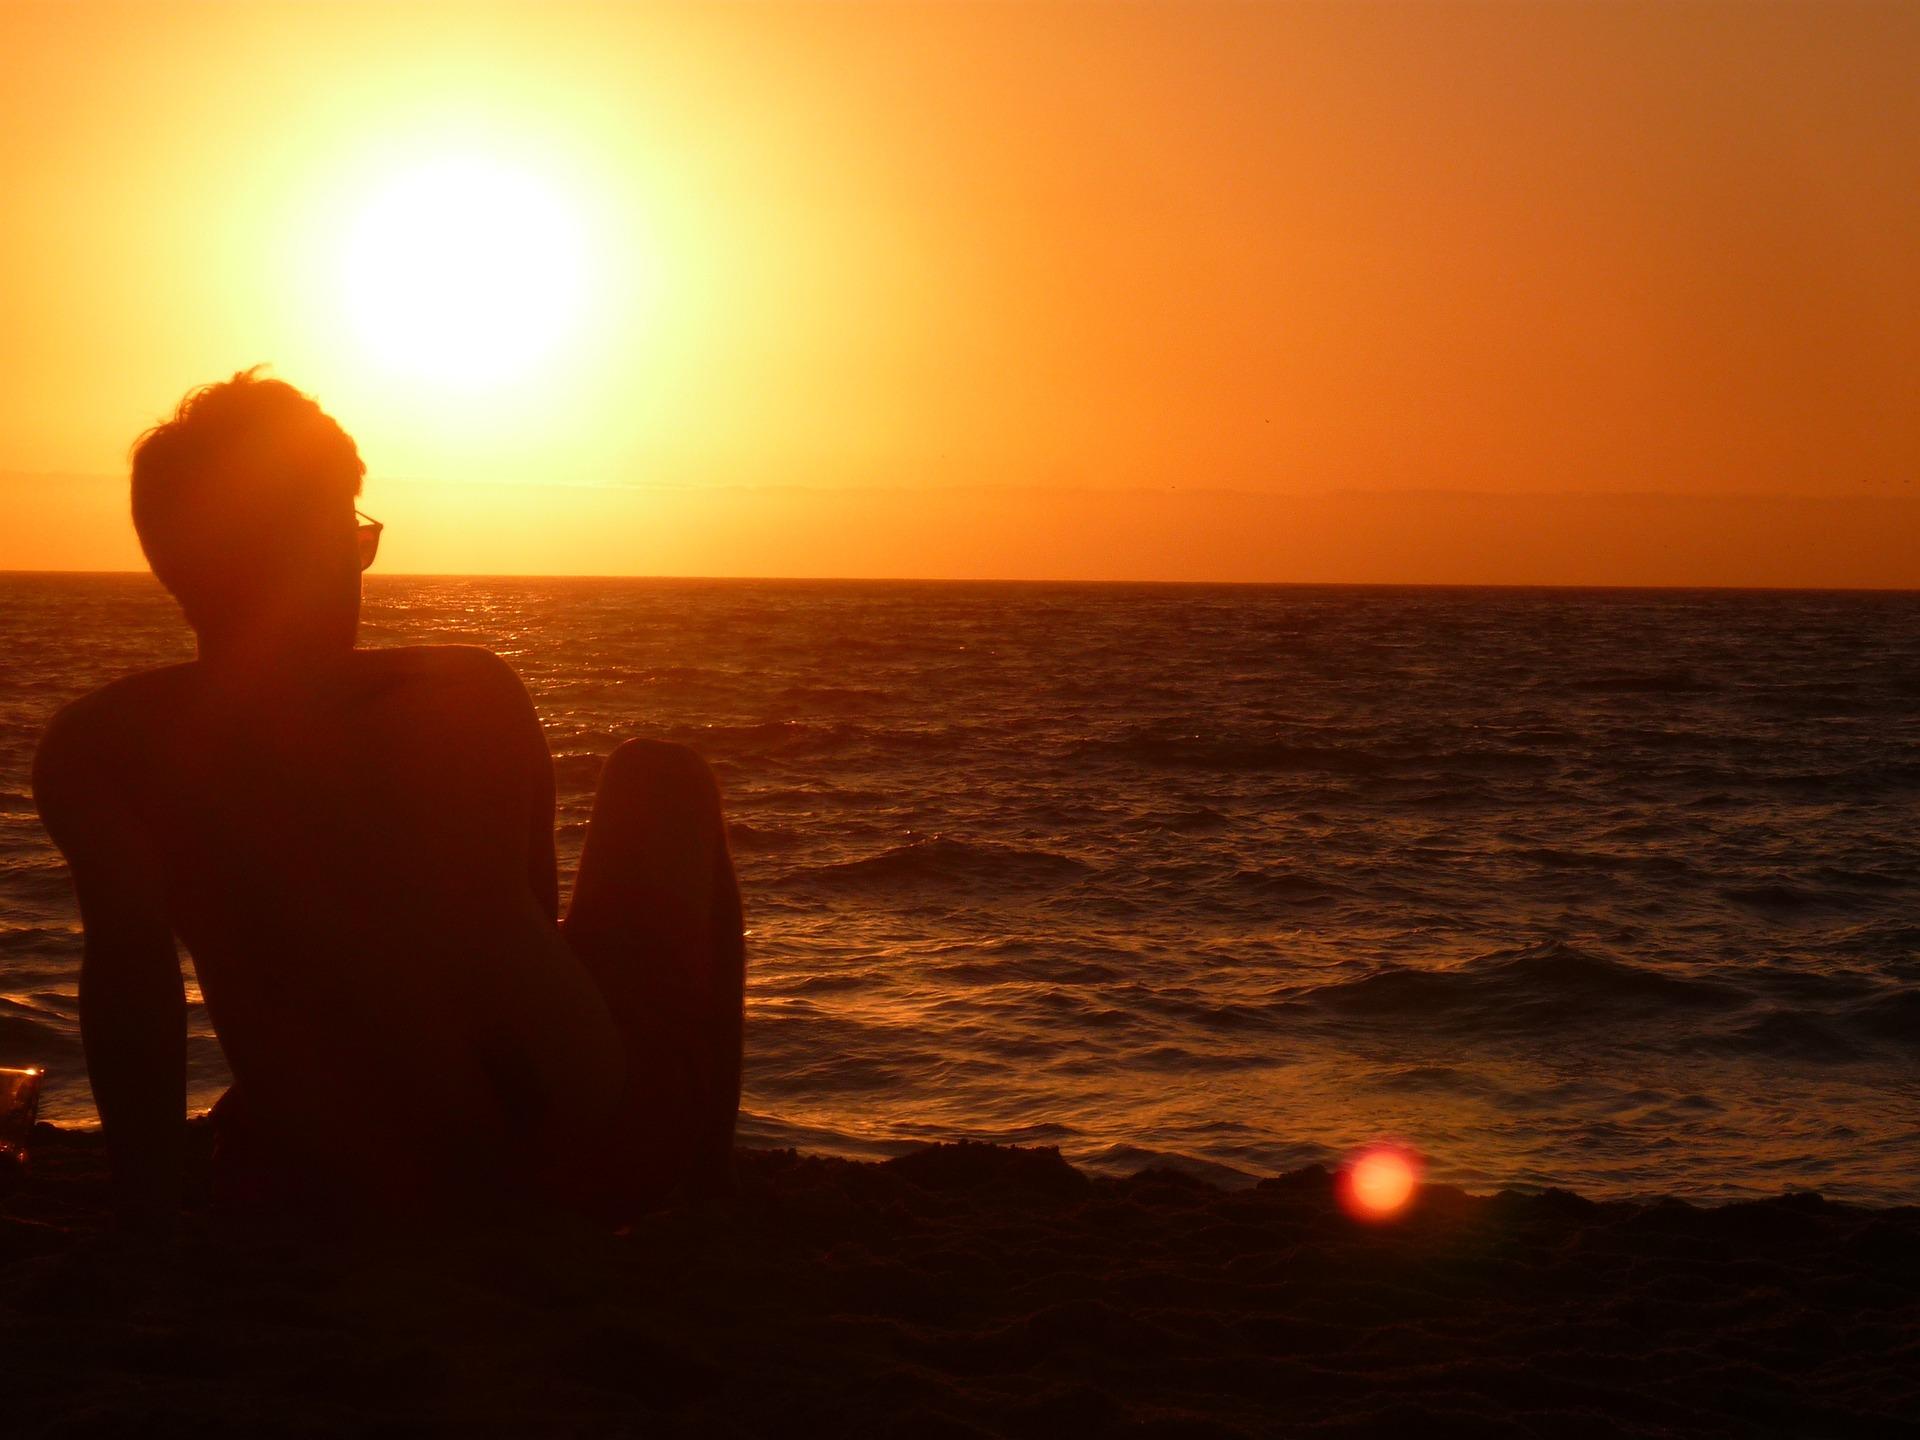 sunset-1487716_1920.jpg